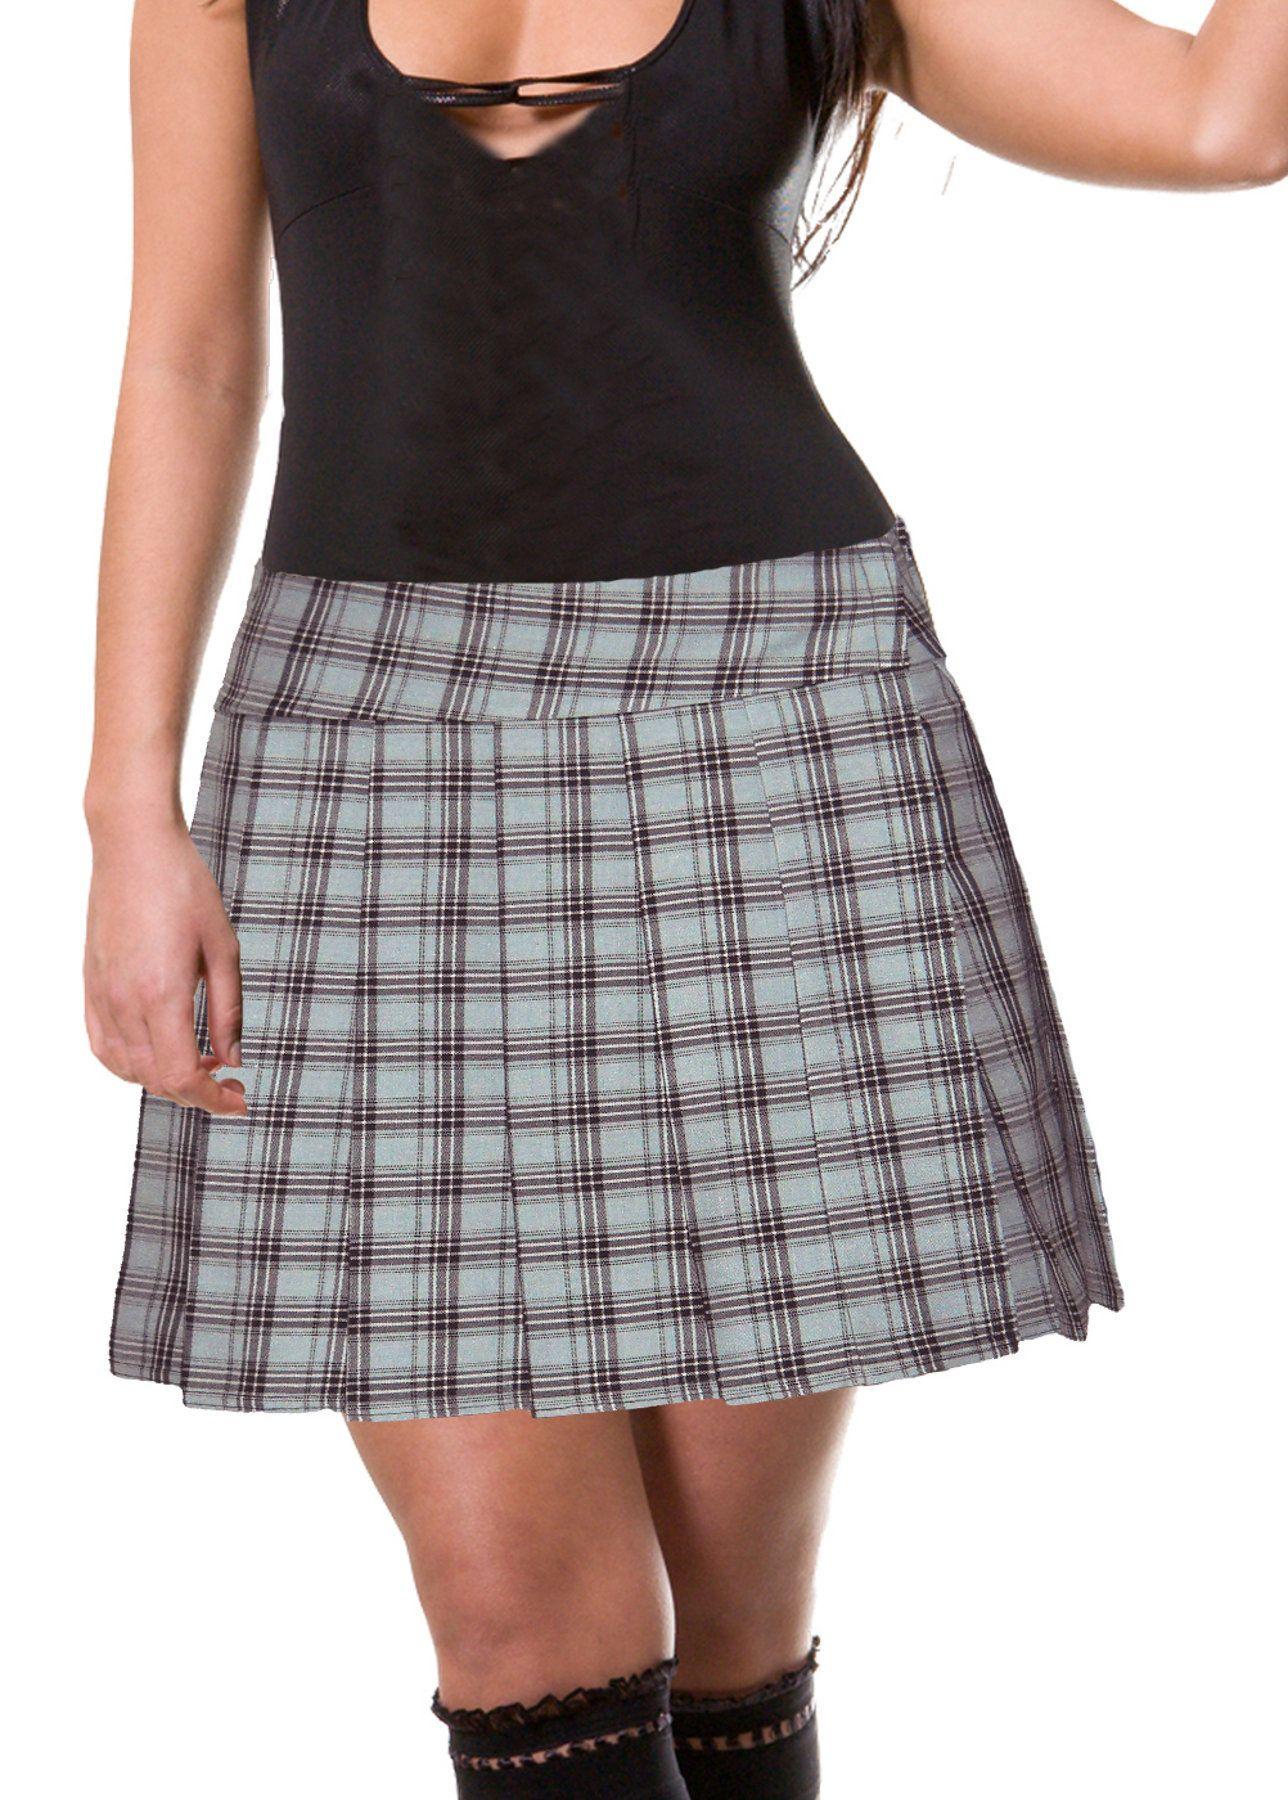 Gawler Junior to Plus Size Light Gray Schoolgirl Plaid Pleated Mini Skirt